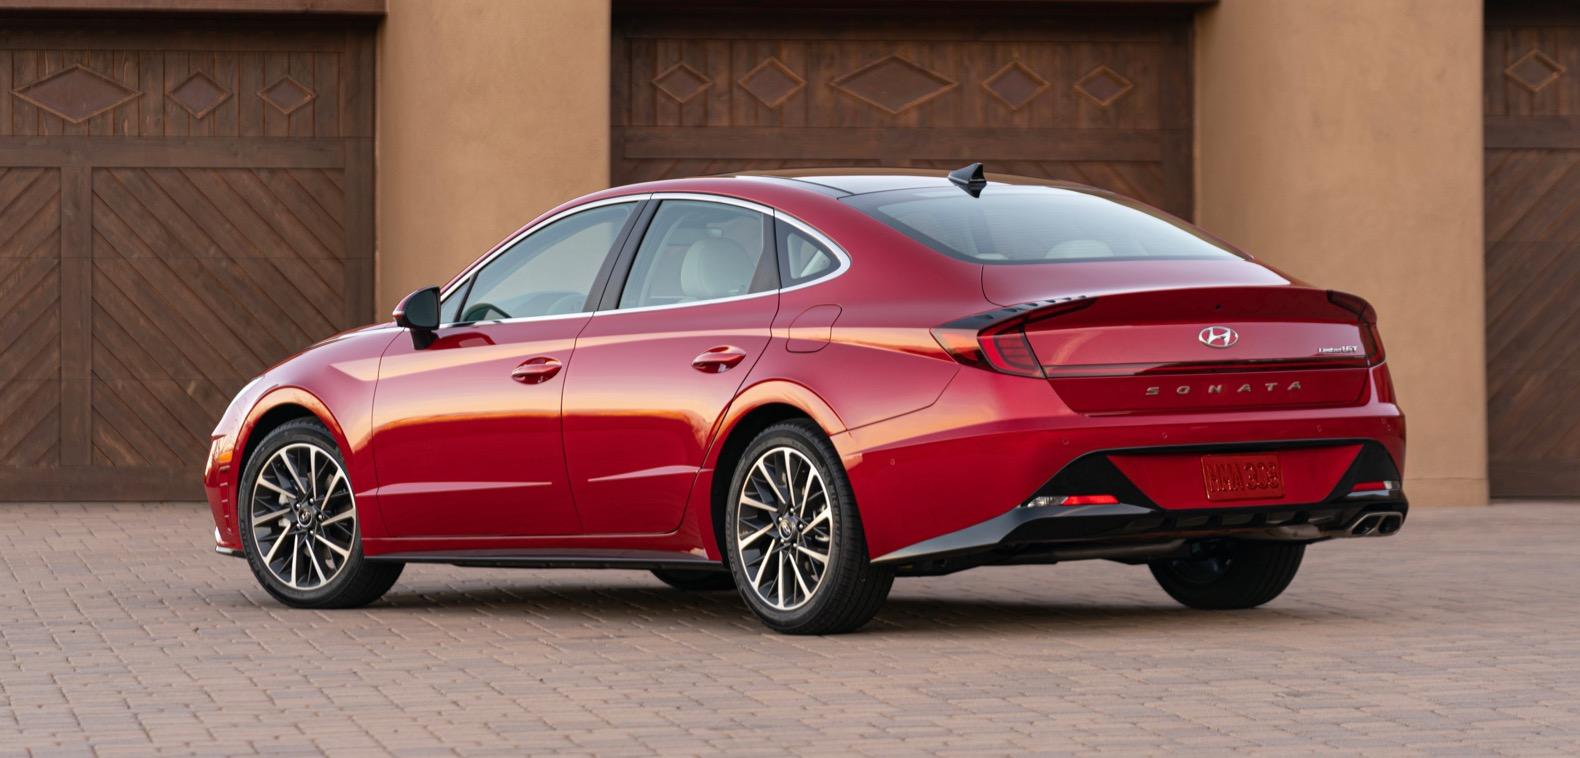 2020 Hyundai Sonata Review: A great midsize sedan | The ...